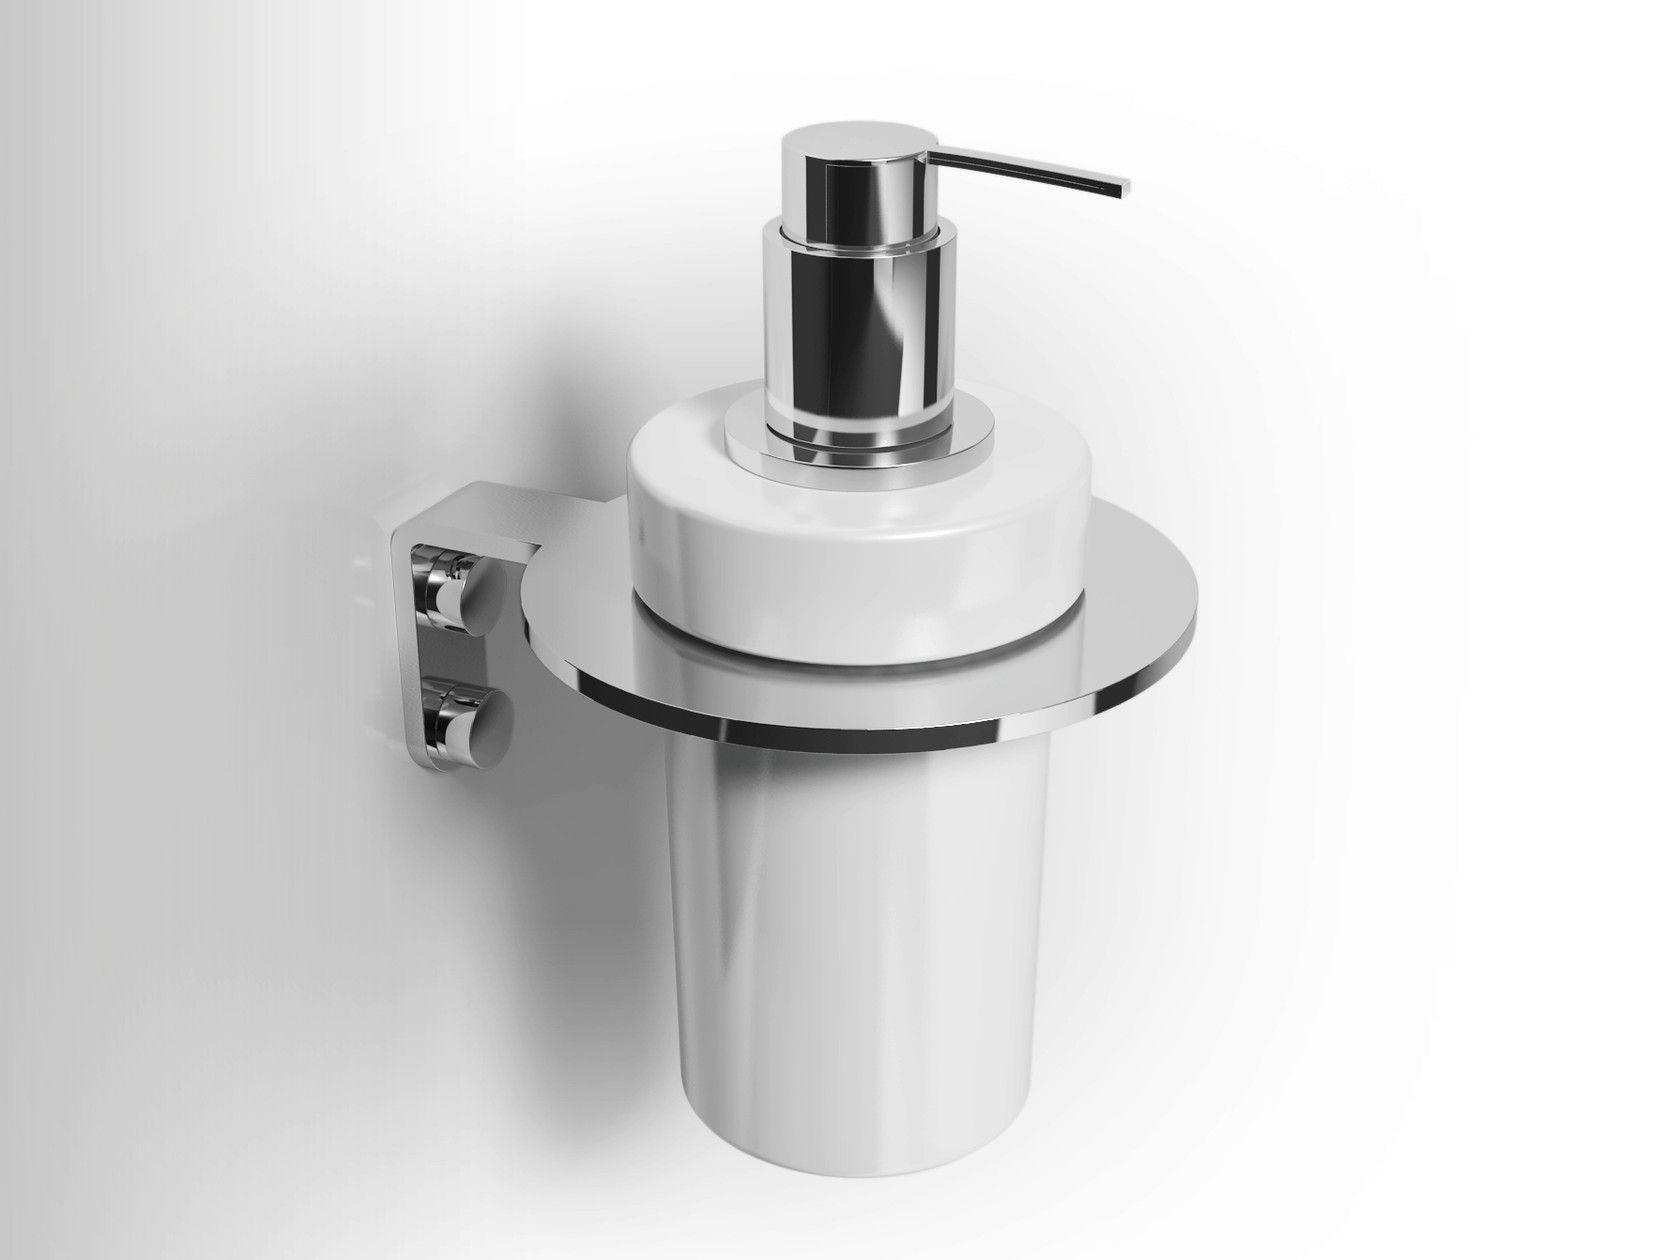 Wall Mounted Ceramic Liquid Soap Dispenser Lobelia Inox Liquid Soap Dispenser By Alna Soap Dispenser Liquid Soap Soap